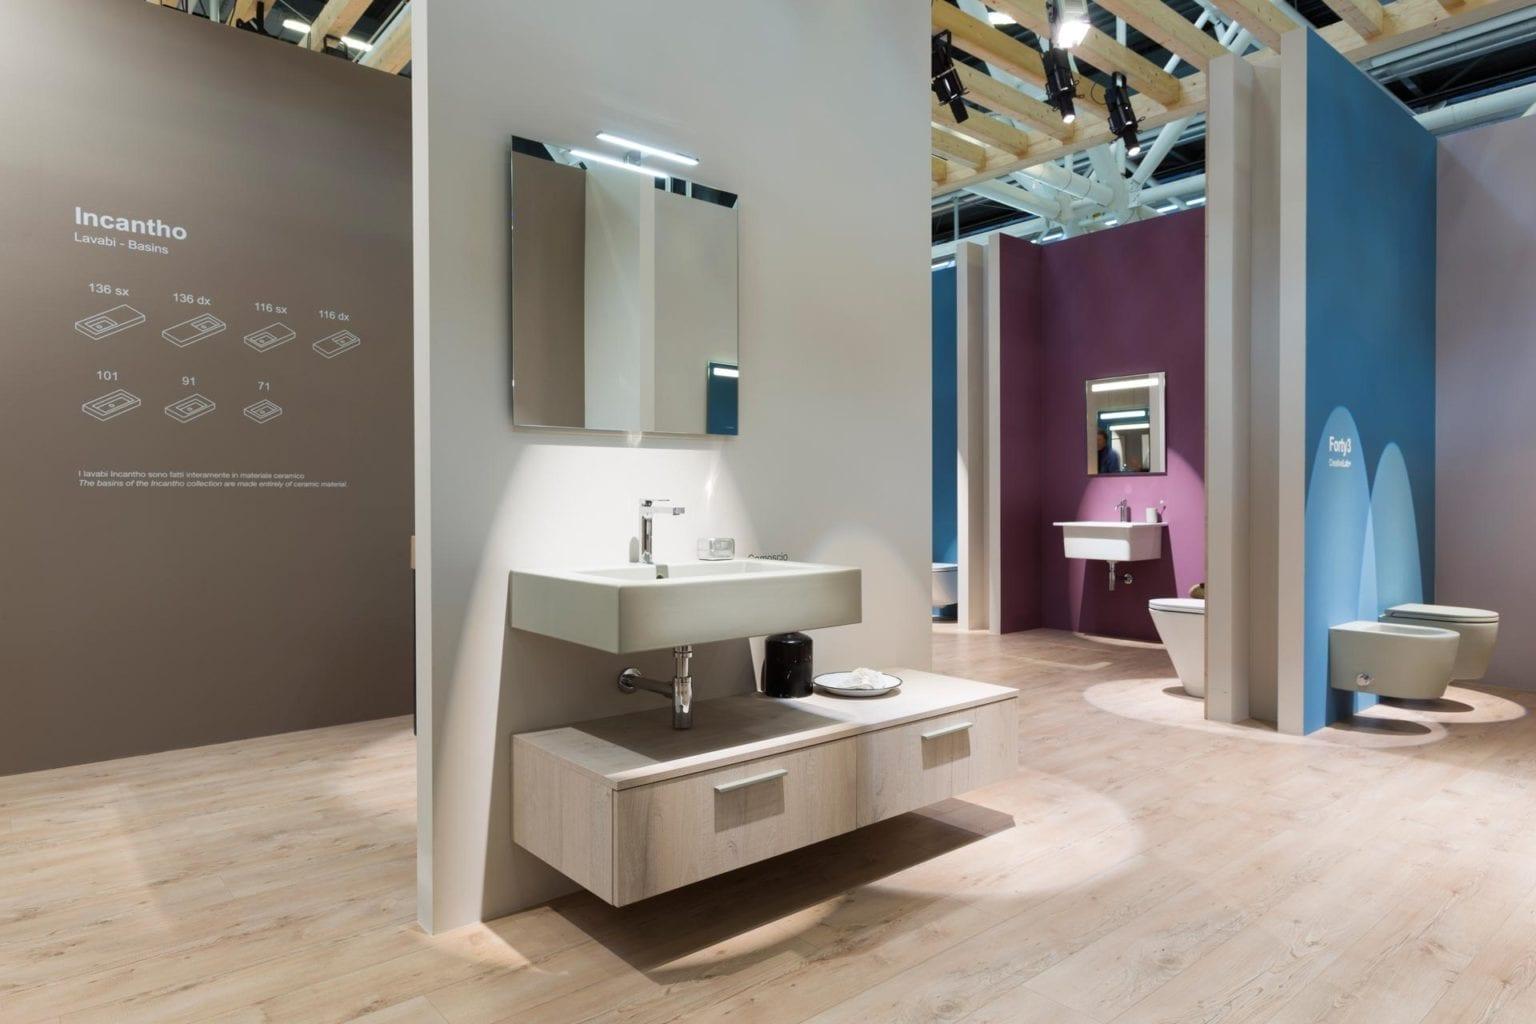 Globo Cersaie 2015 exhibition interior design 06